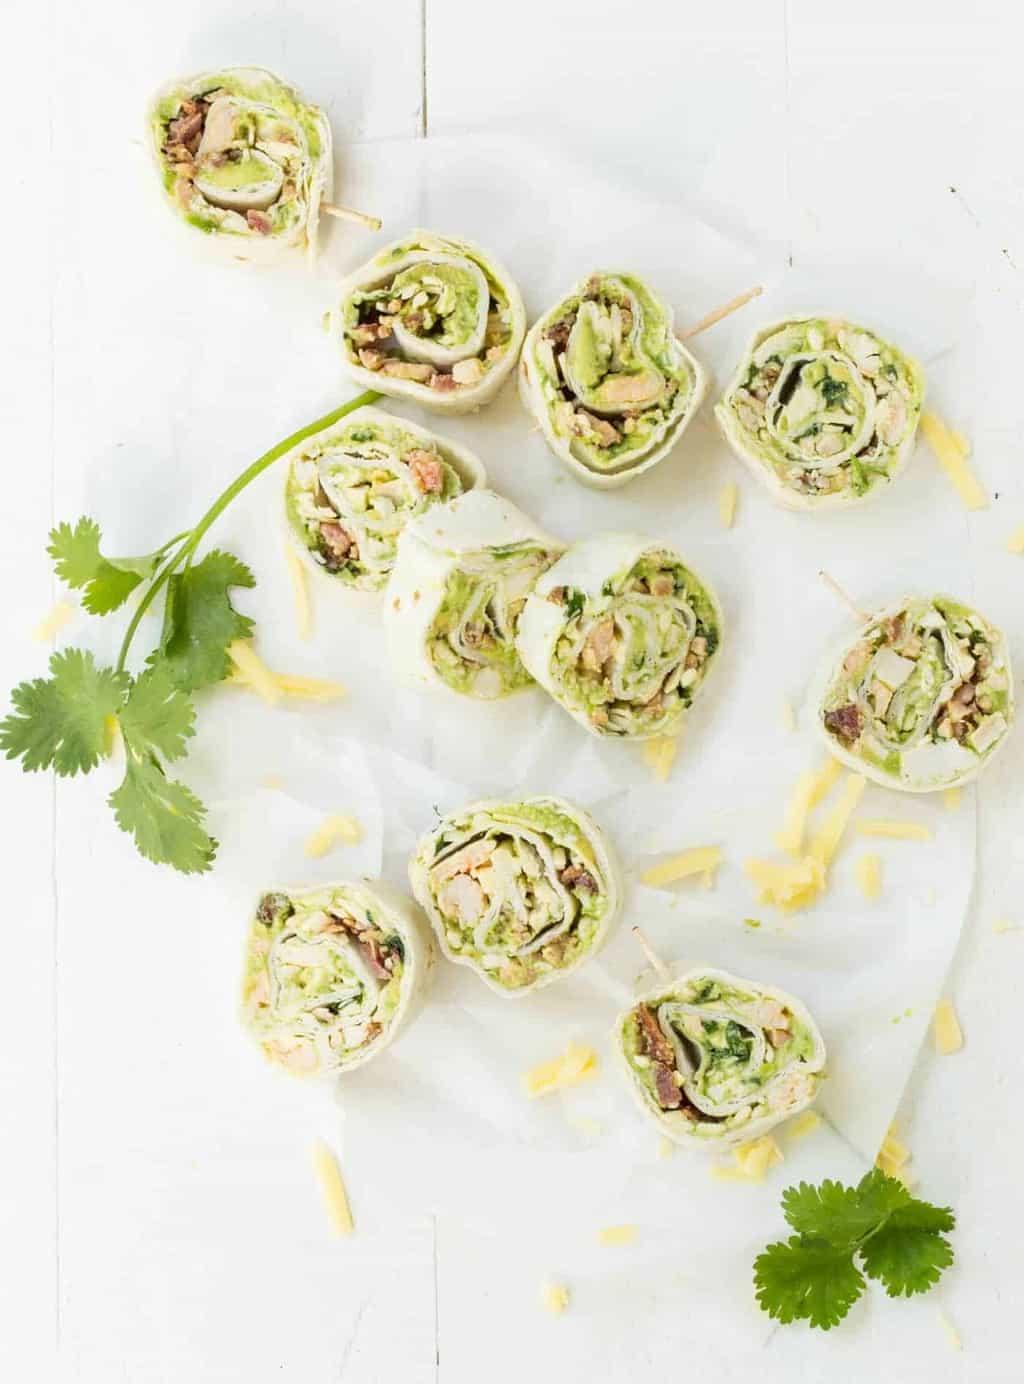 Avocado Bacon Pinwheel slices on parchment paper with cilantro sprig for garnish.